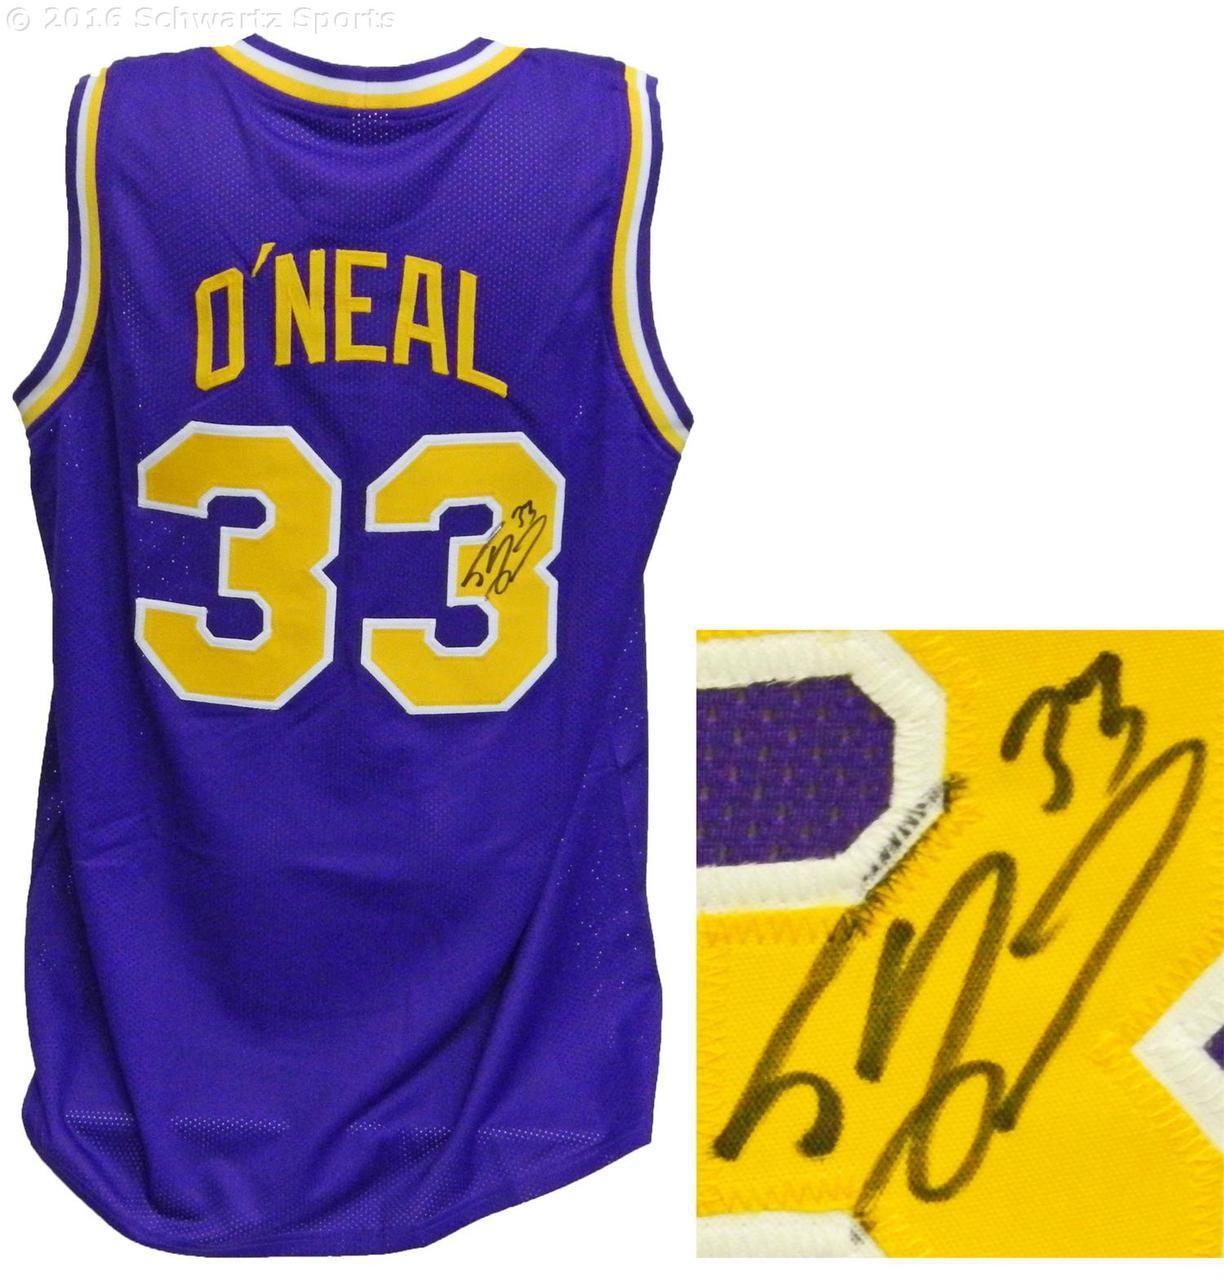 837e1a9ec20 Shaquille O'Neal Signed LSU Tigers Purple Throwback Custom College  Basketball Jersey - Schwartz COA